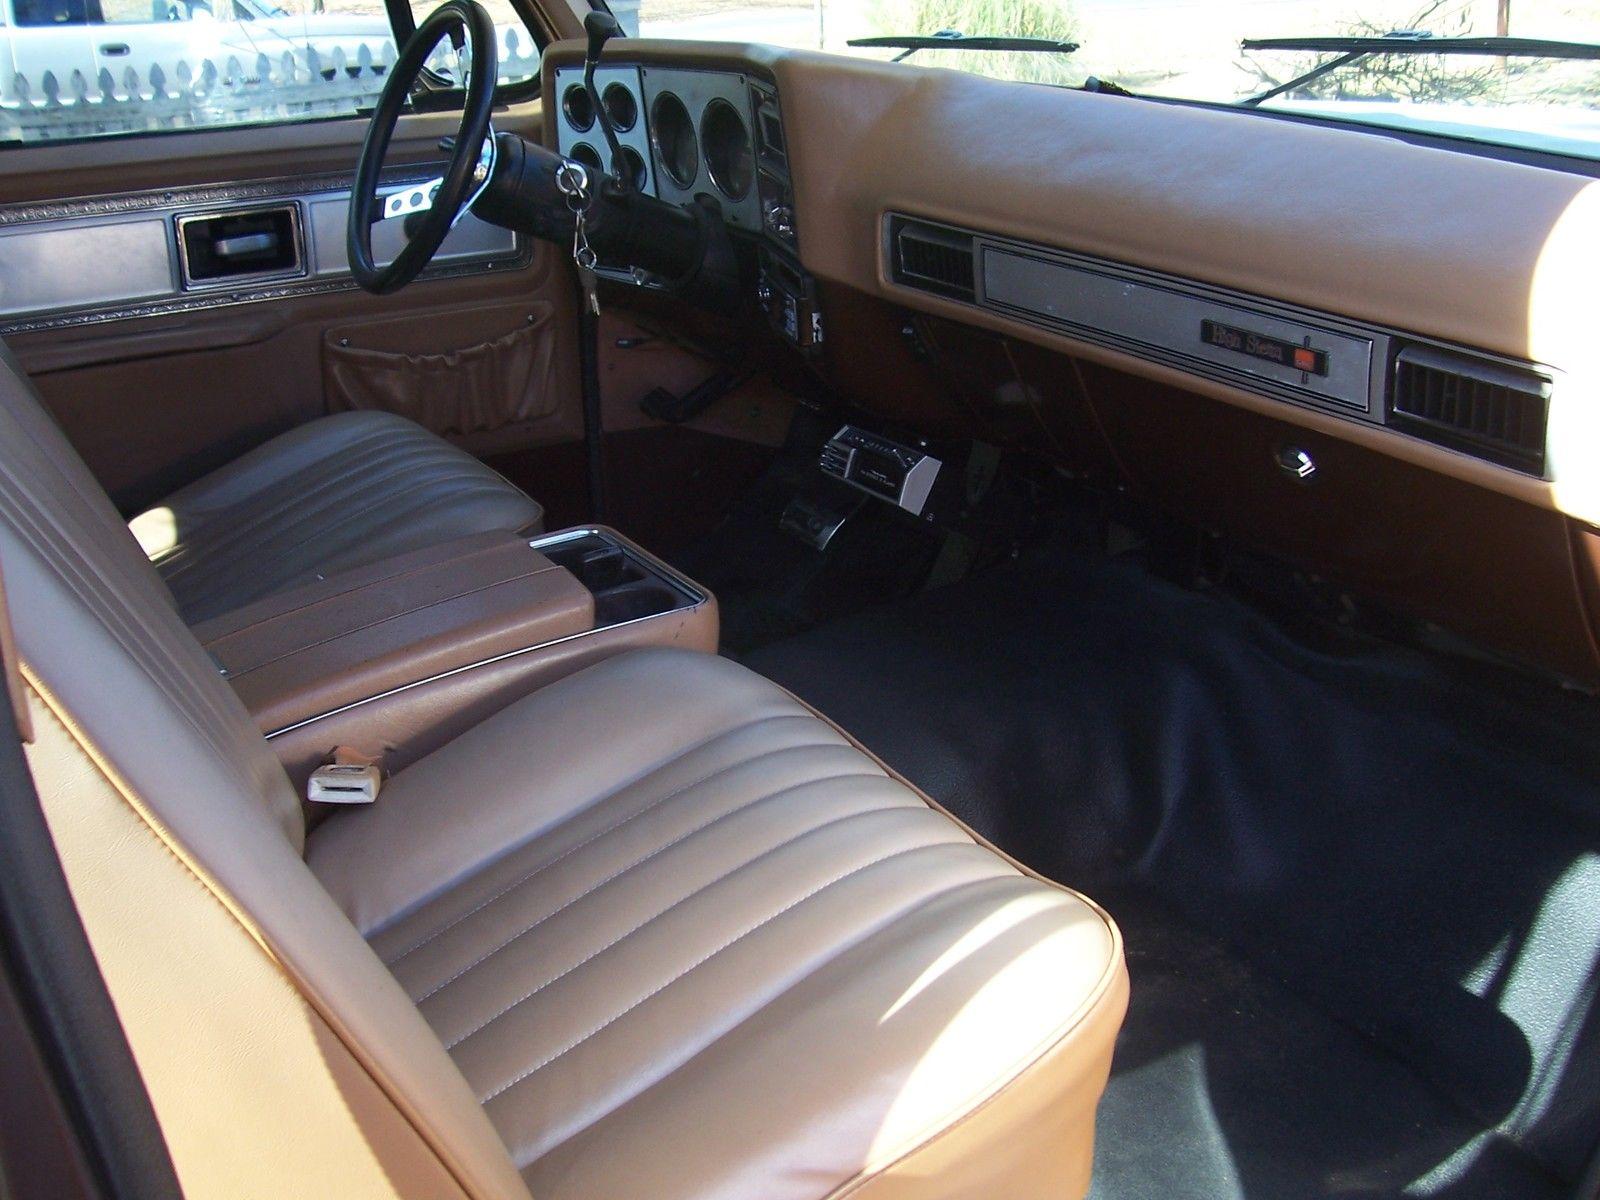 VERY NICE 1979 GMC JIMMY CHEVROLET BLAZER K5 2WD C-10 HOT ...